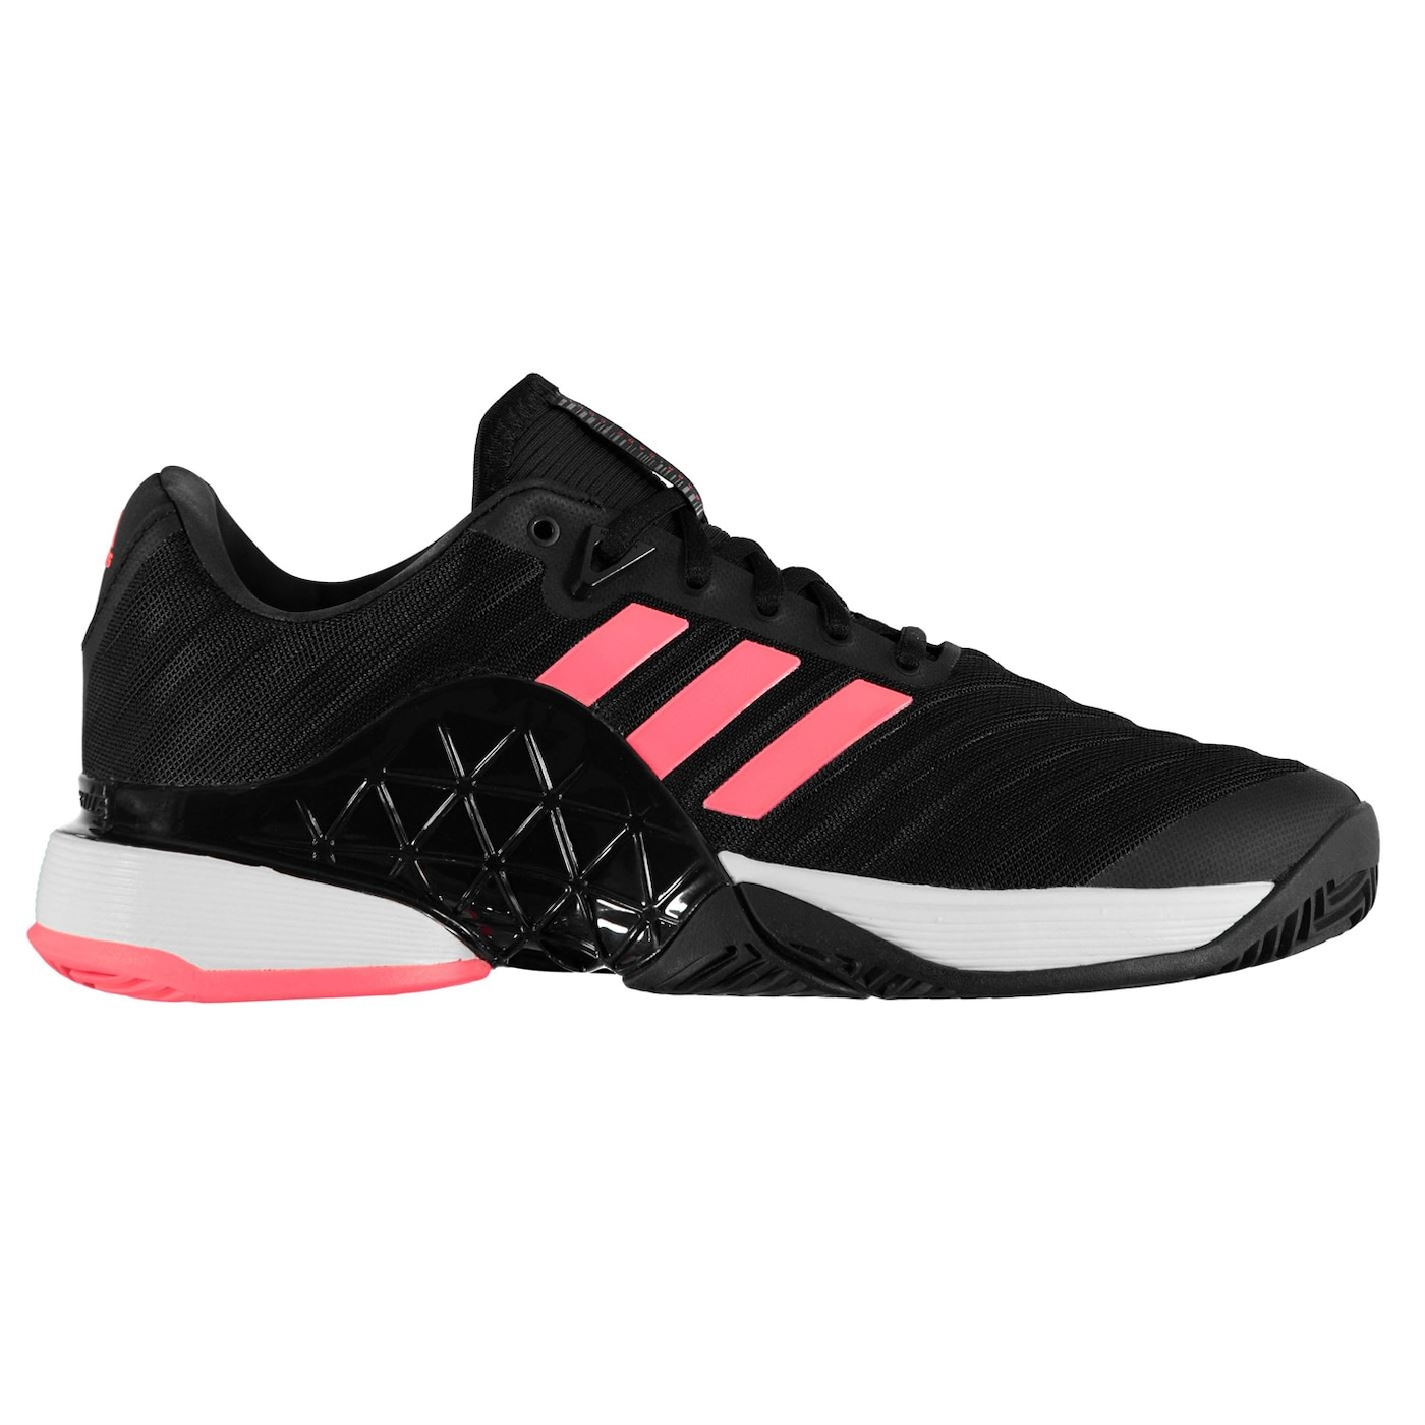 Adidas Barricade 2018 Mens Tennis Shoes